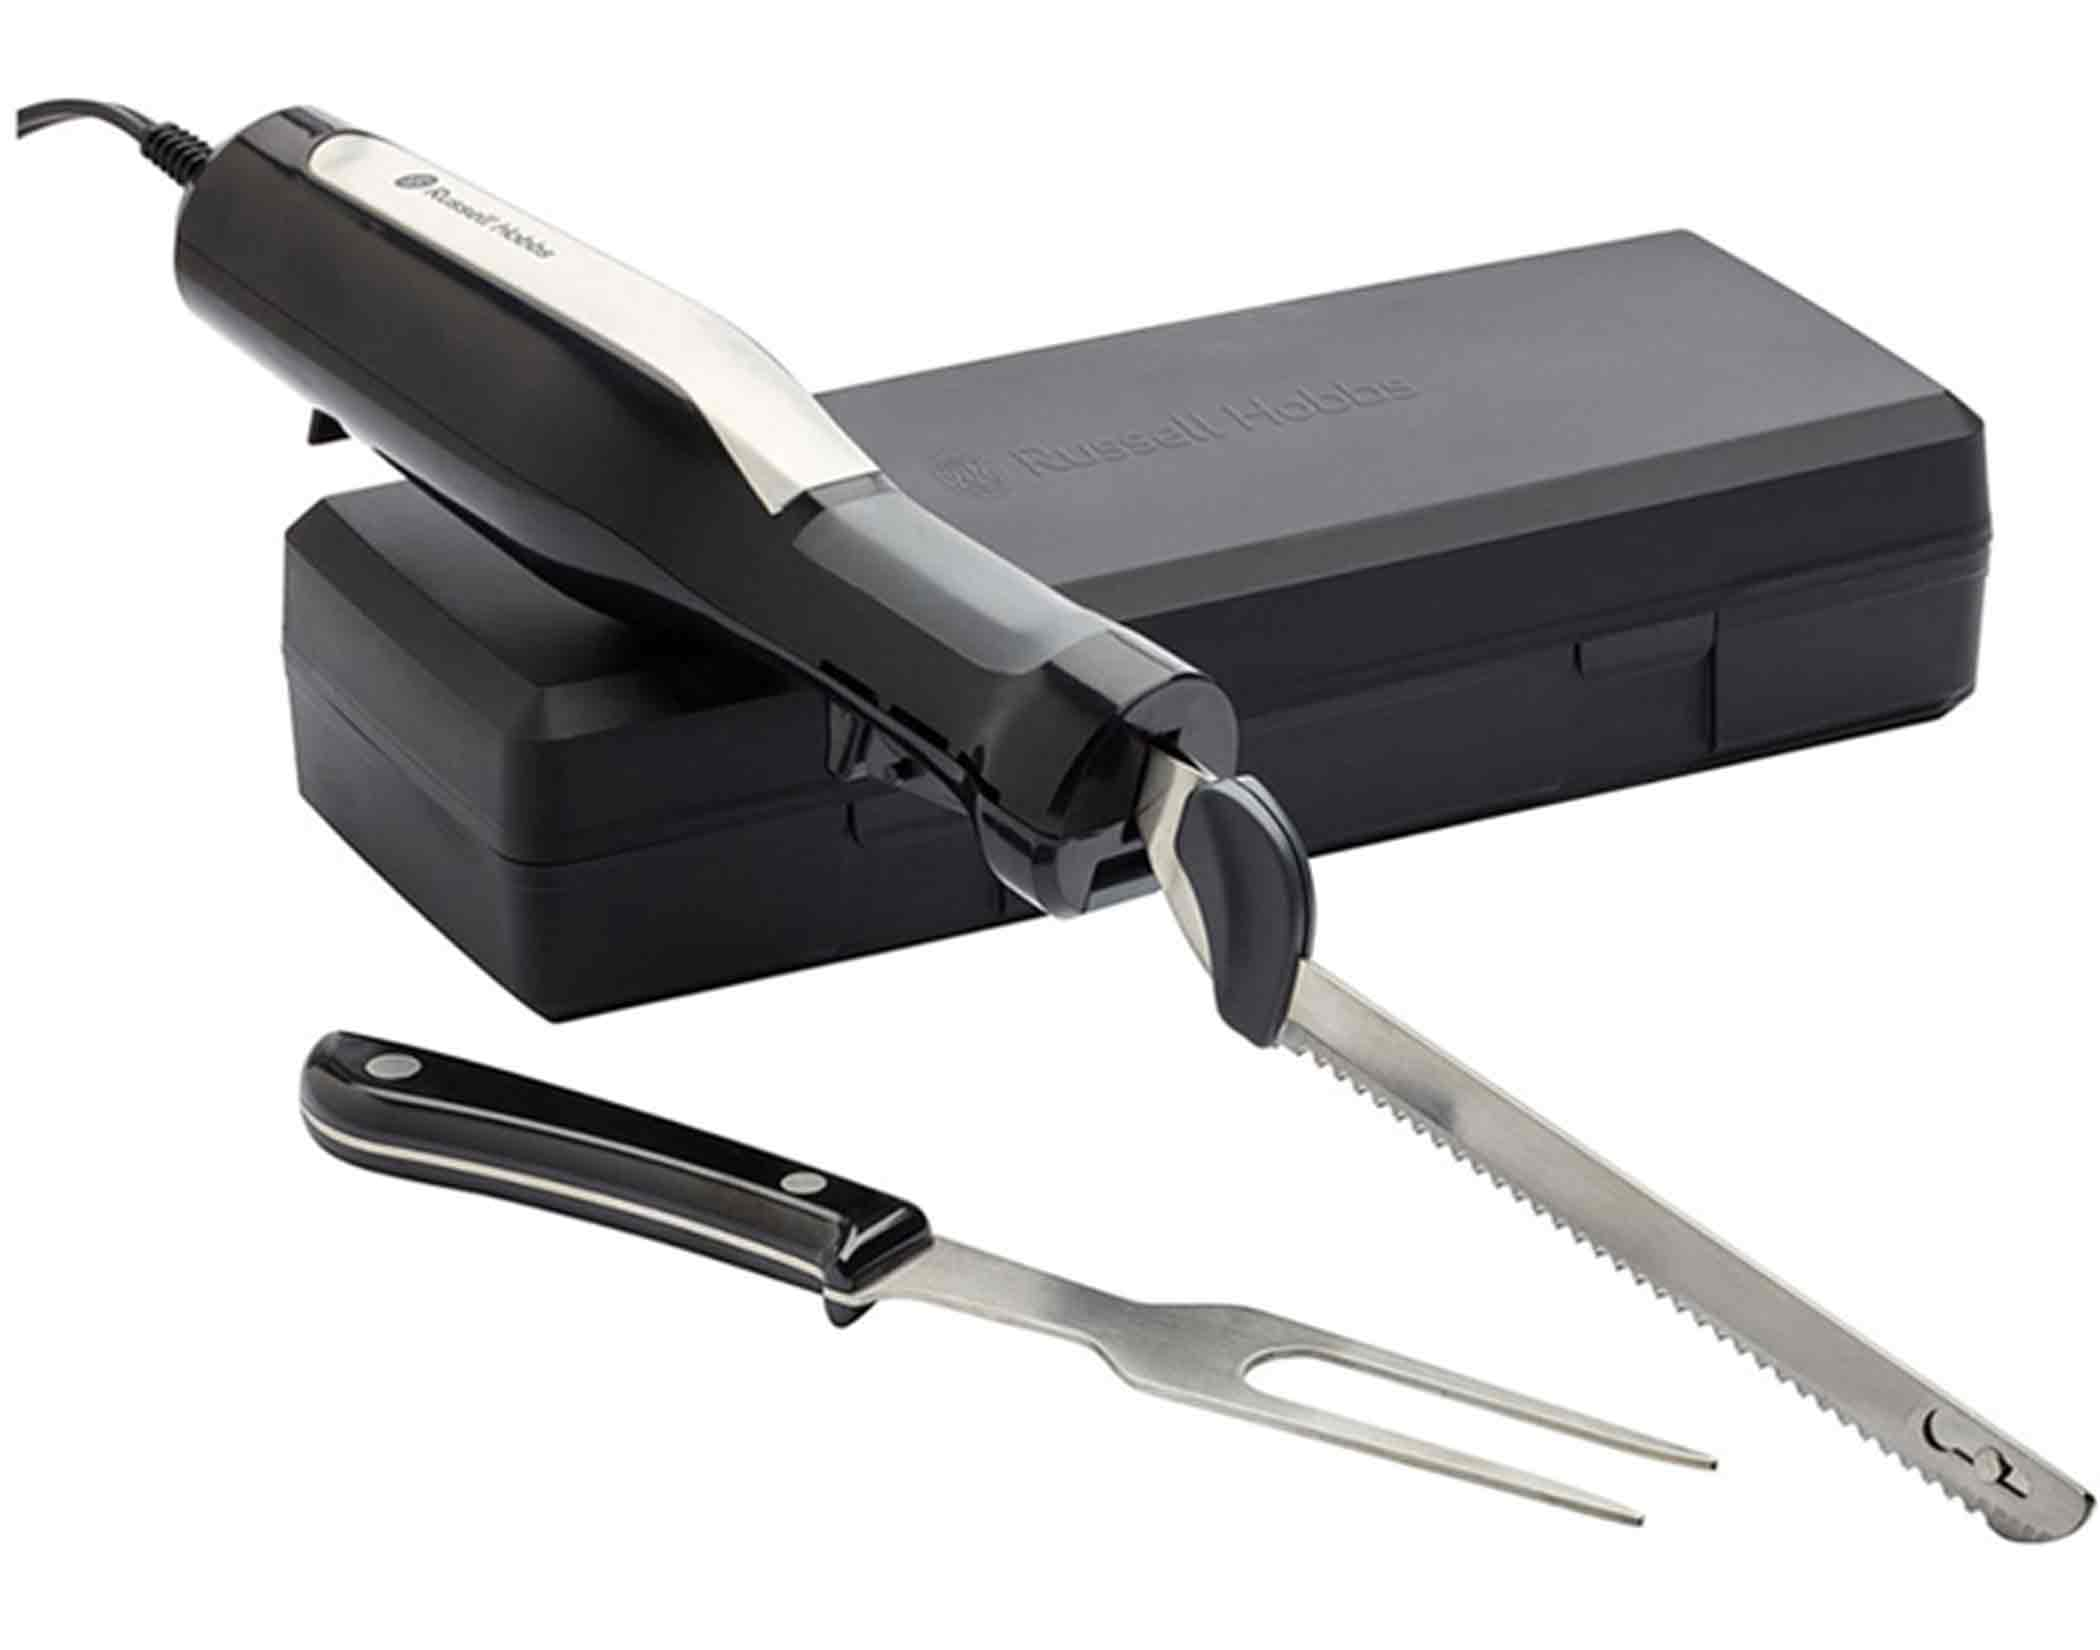 Russell Hobbs RHEK600A Elite Carve Electric Knife Main